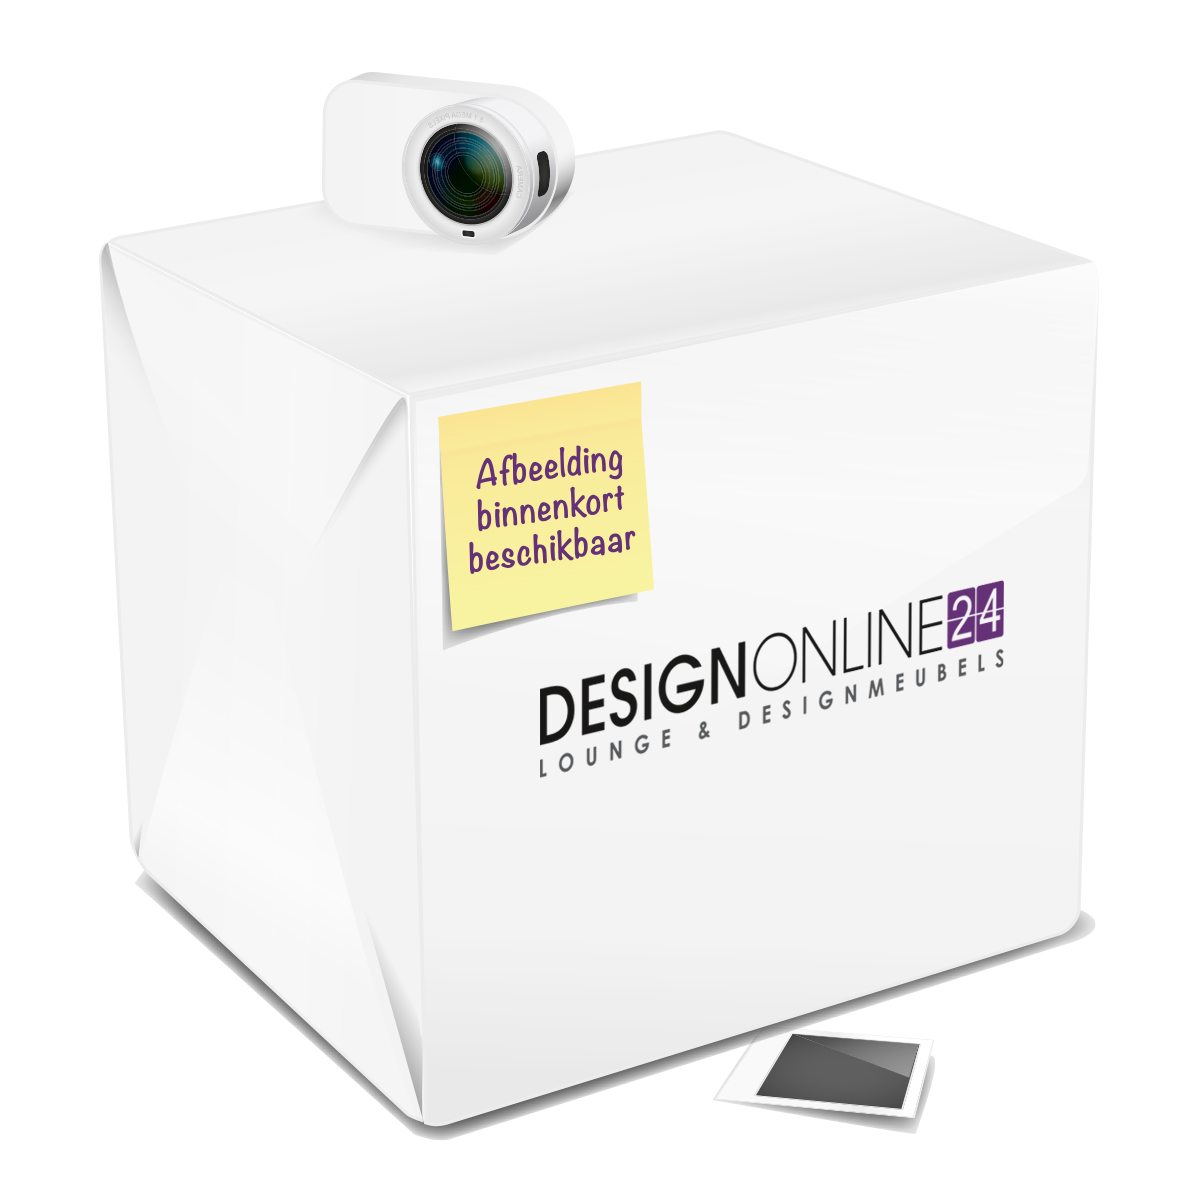 d-Bodhi Fendy Boekenkast 2-Deurs-7-Vakken - L110 x B35 x H190 - Teakhout + Gratis Design Tafellamp twv € 79,95